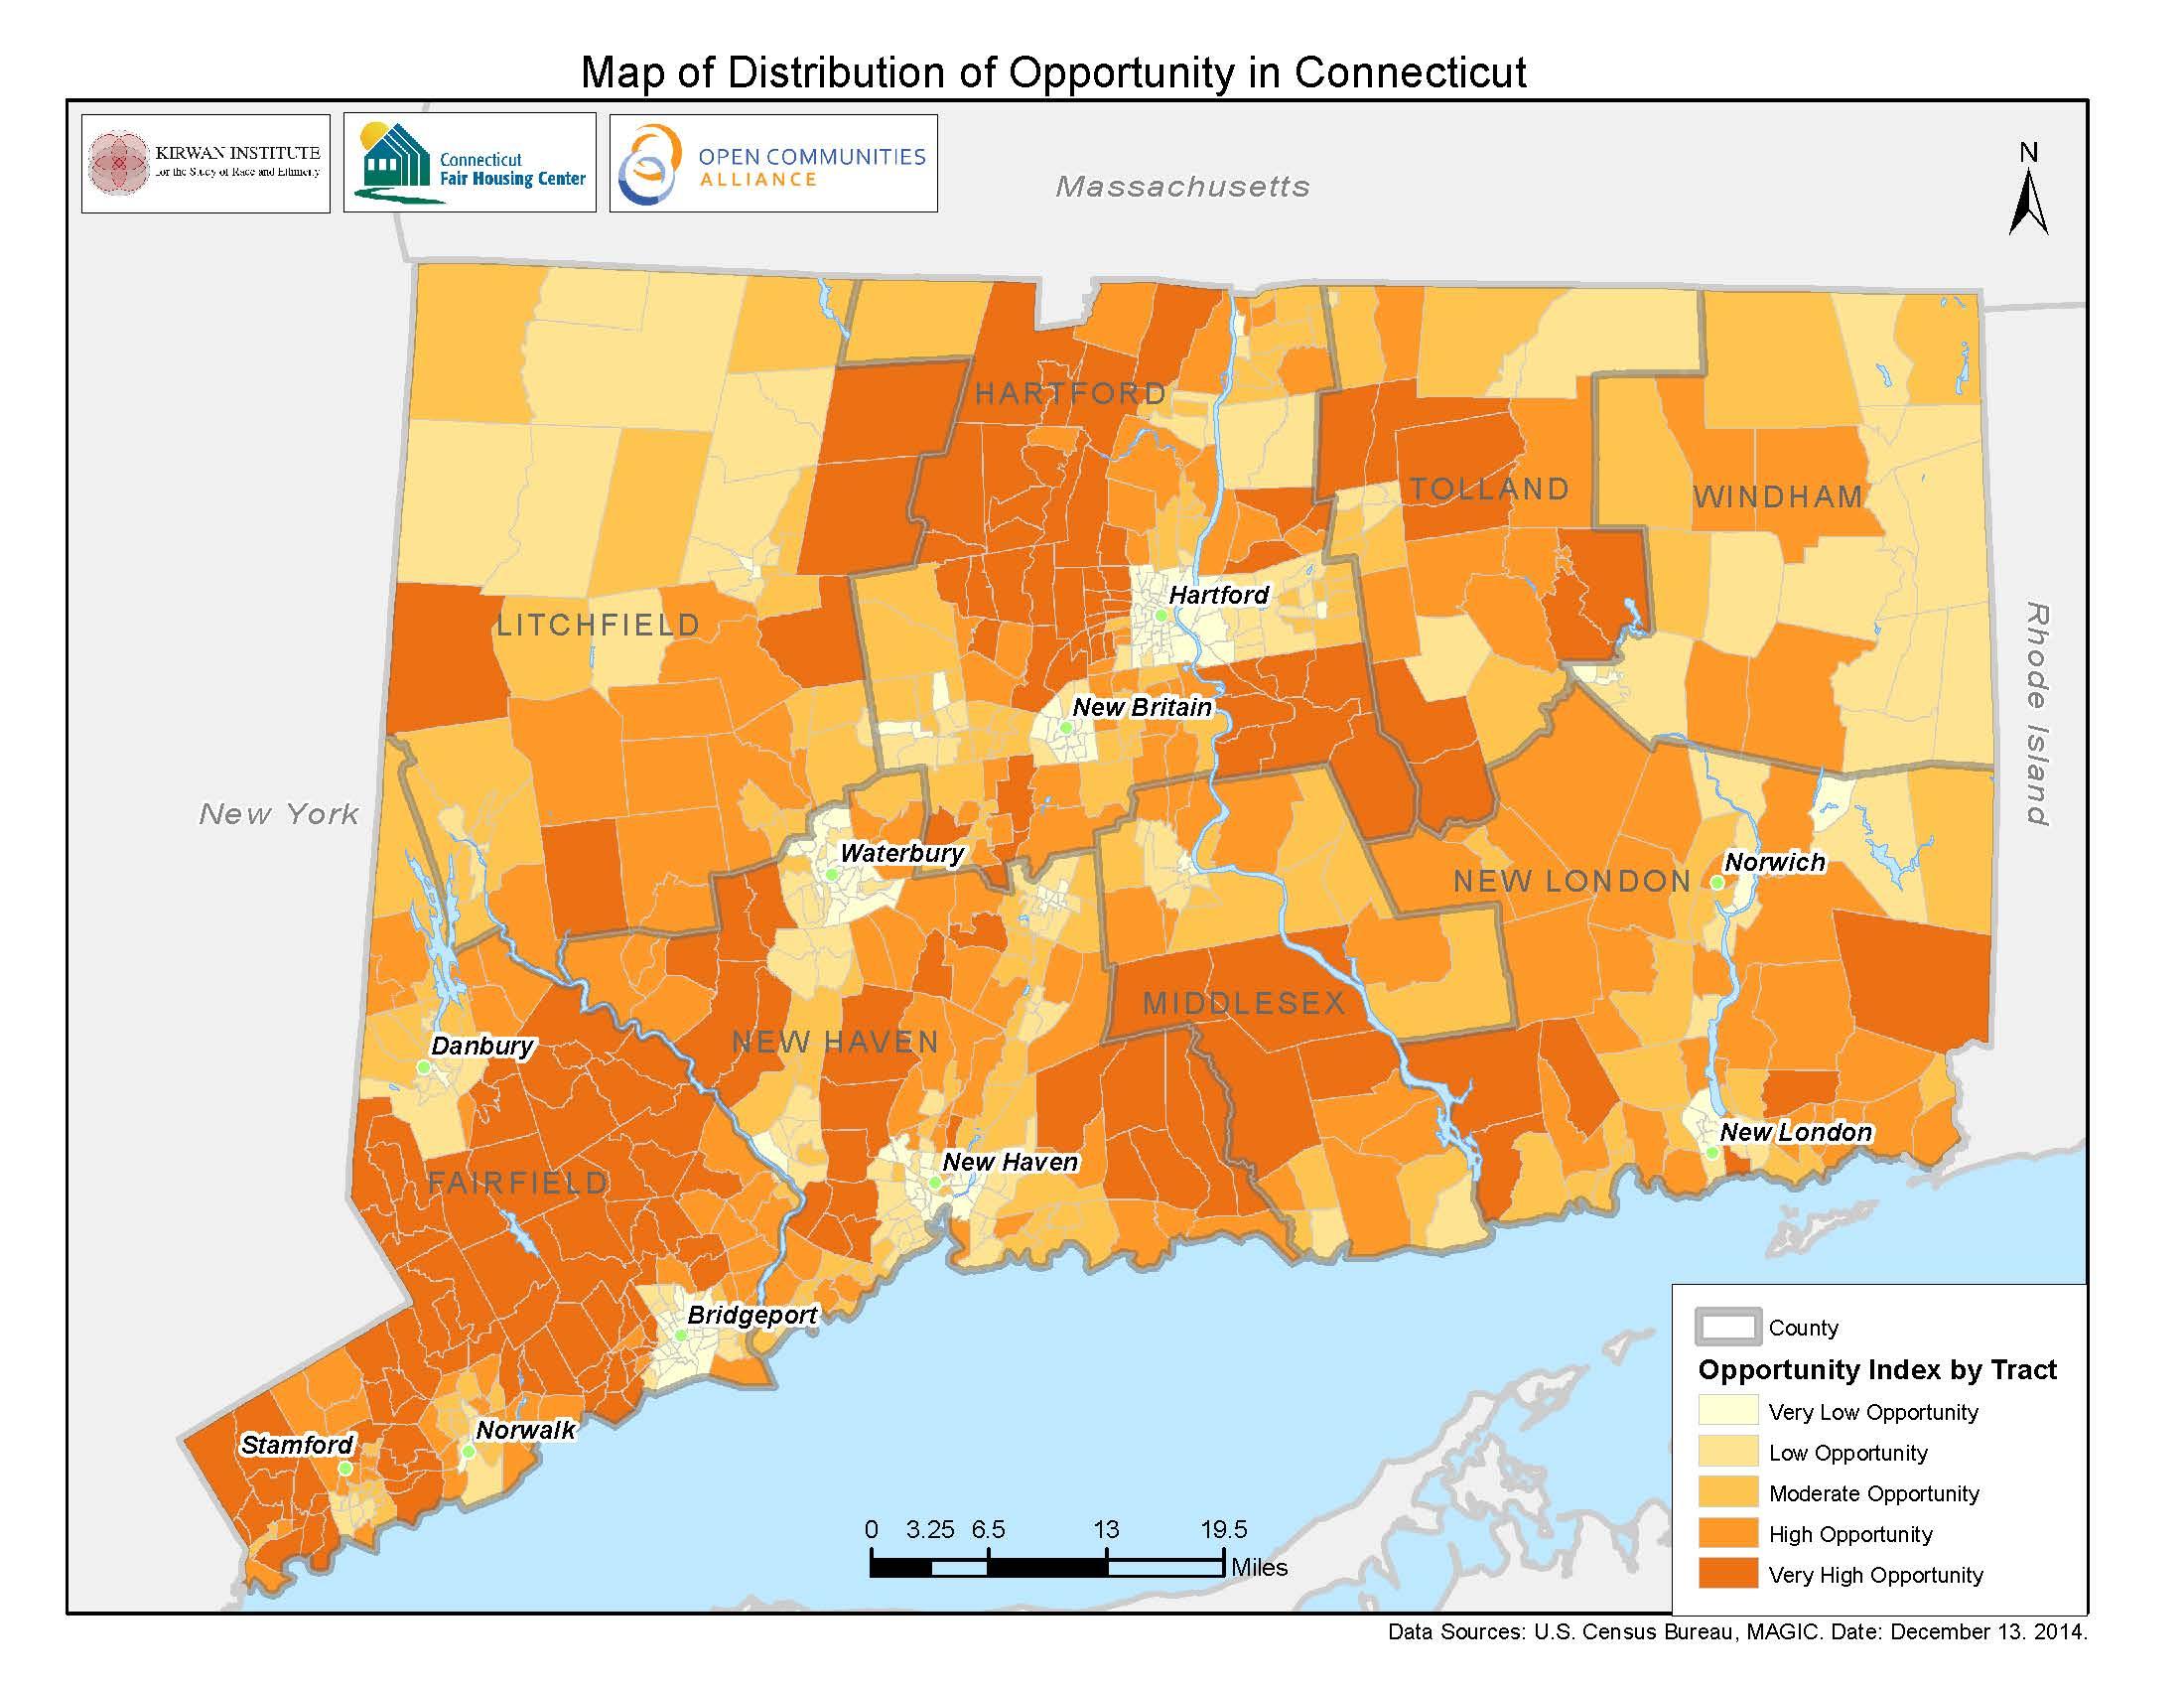 map at Open Communities Alliance